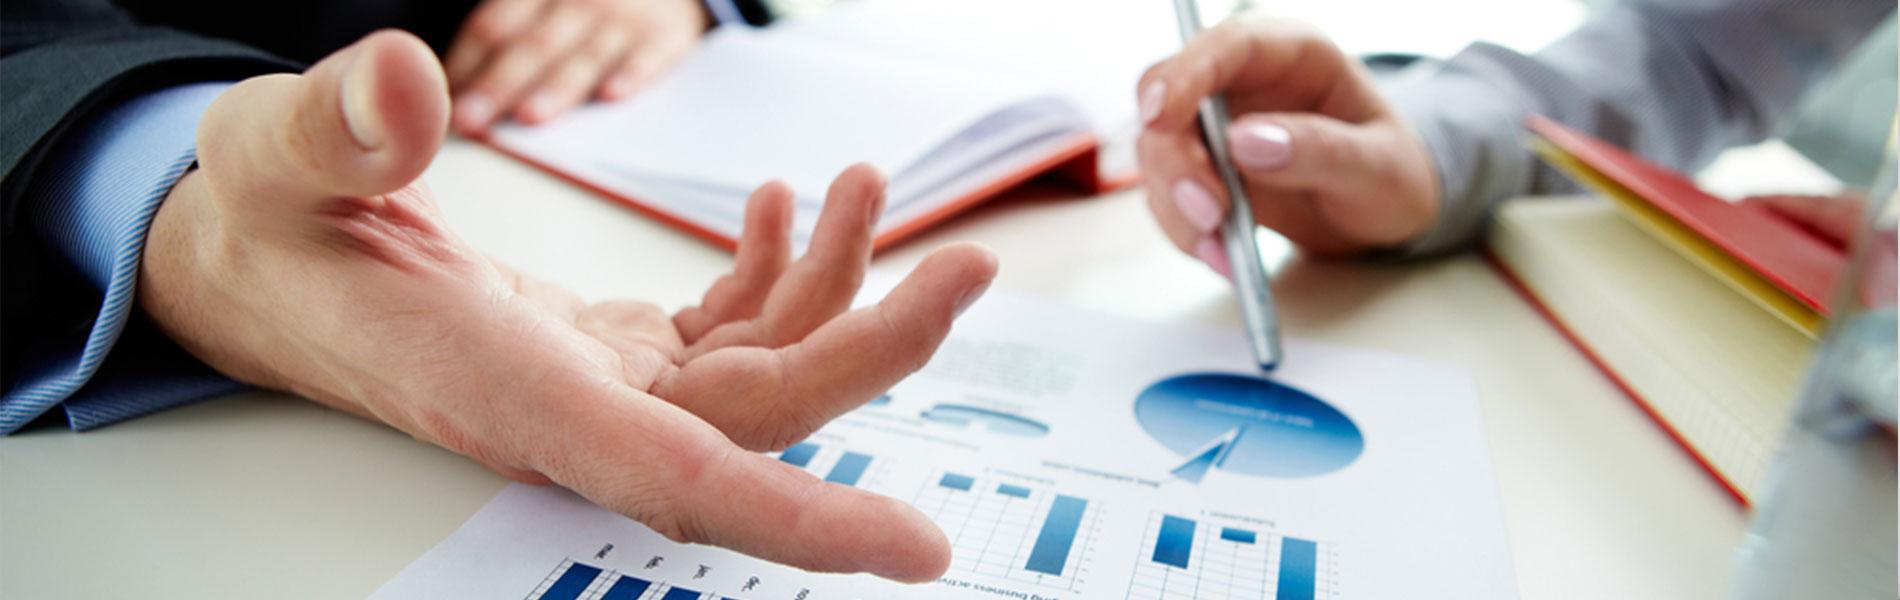 careertech-banking-financial-meeting-analysts.jpg